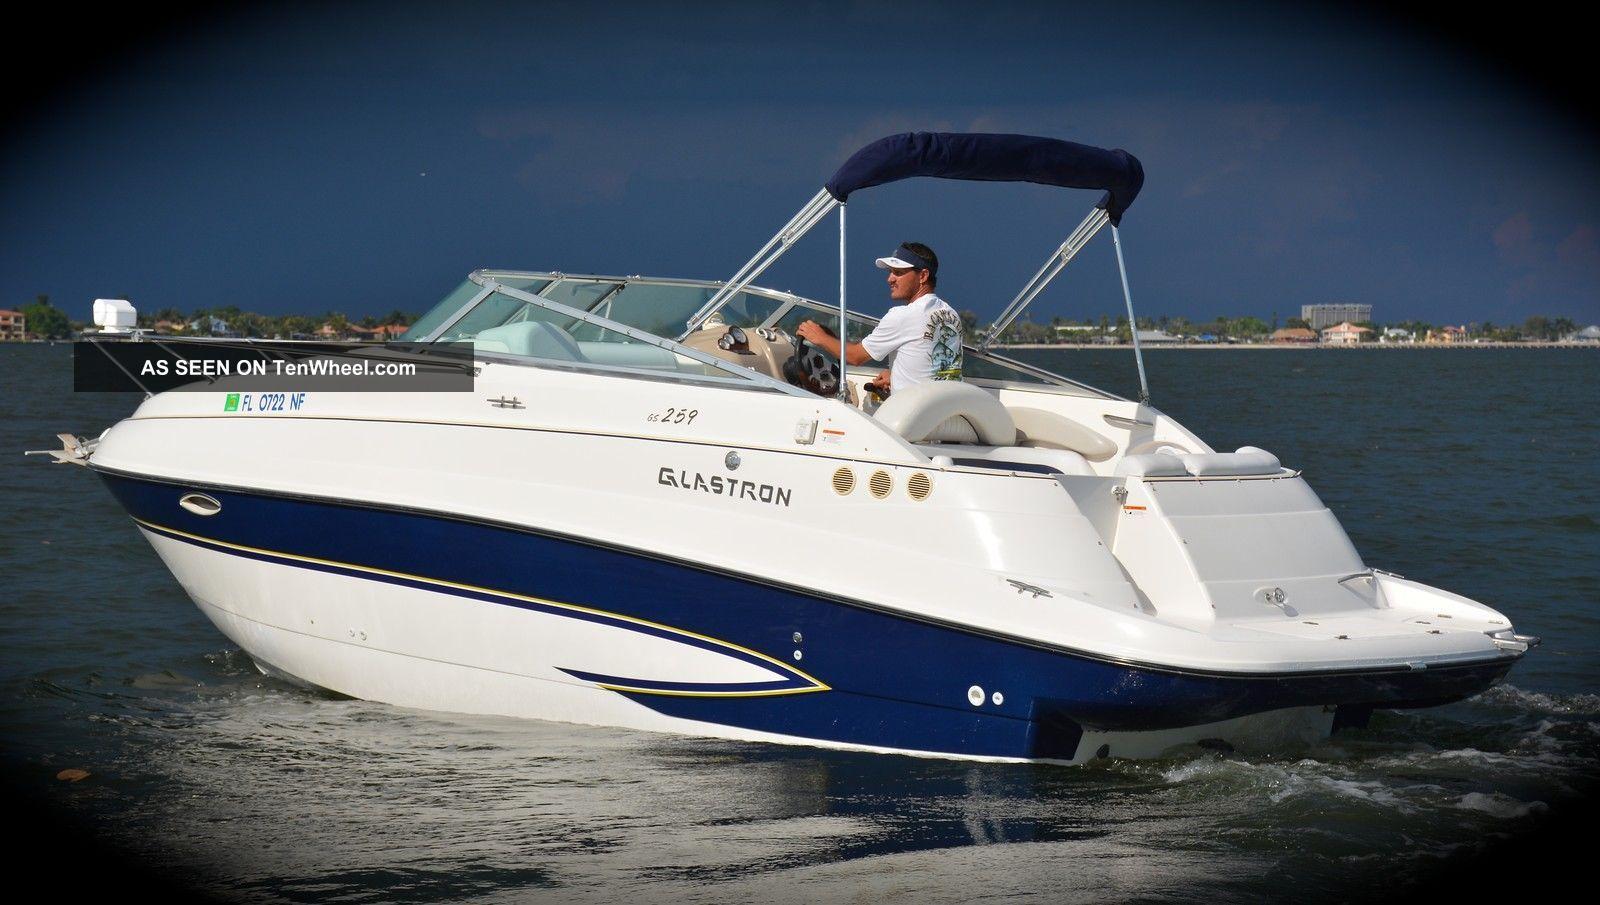 2006 Glastron 259 Cruisers photo